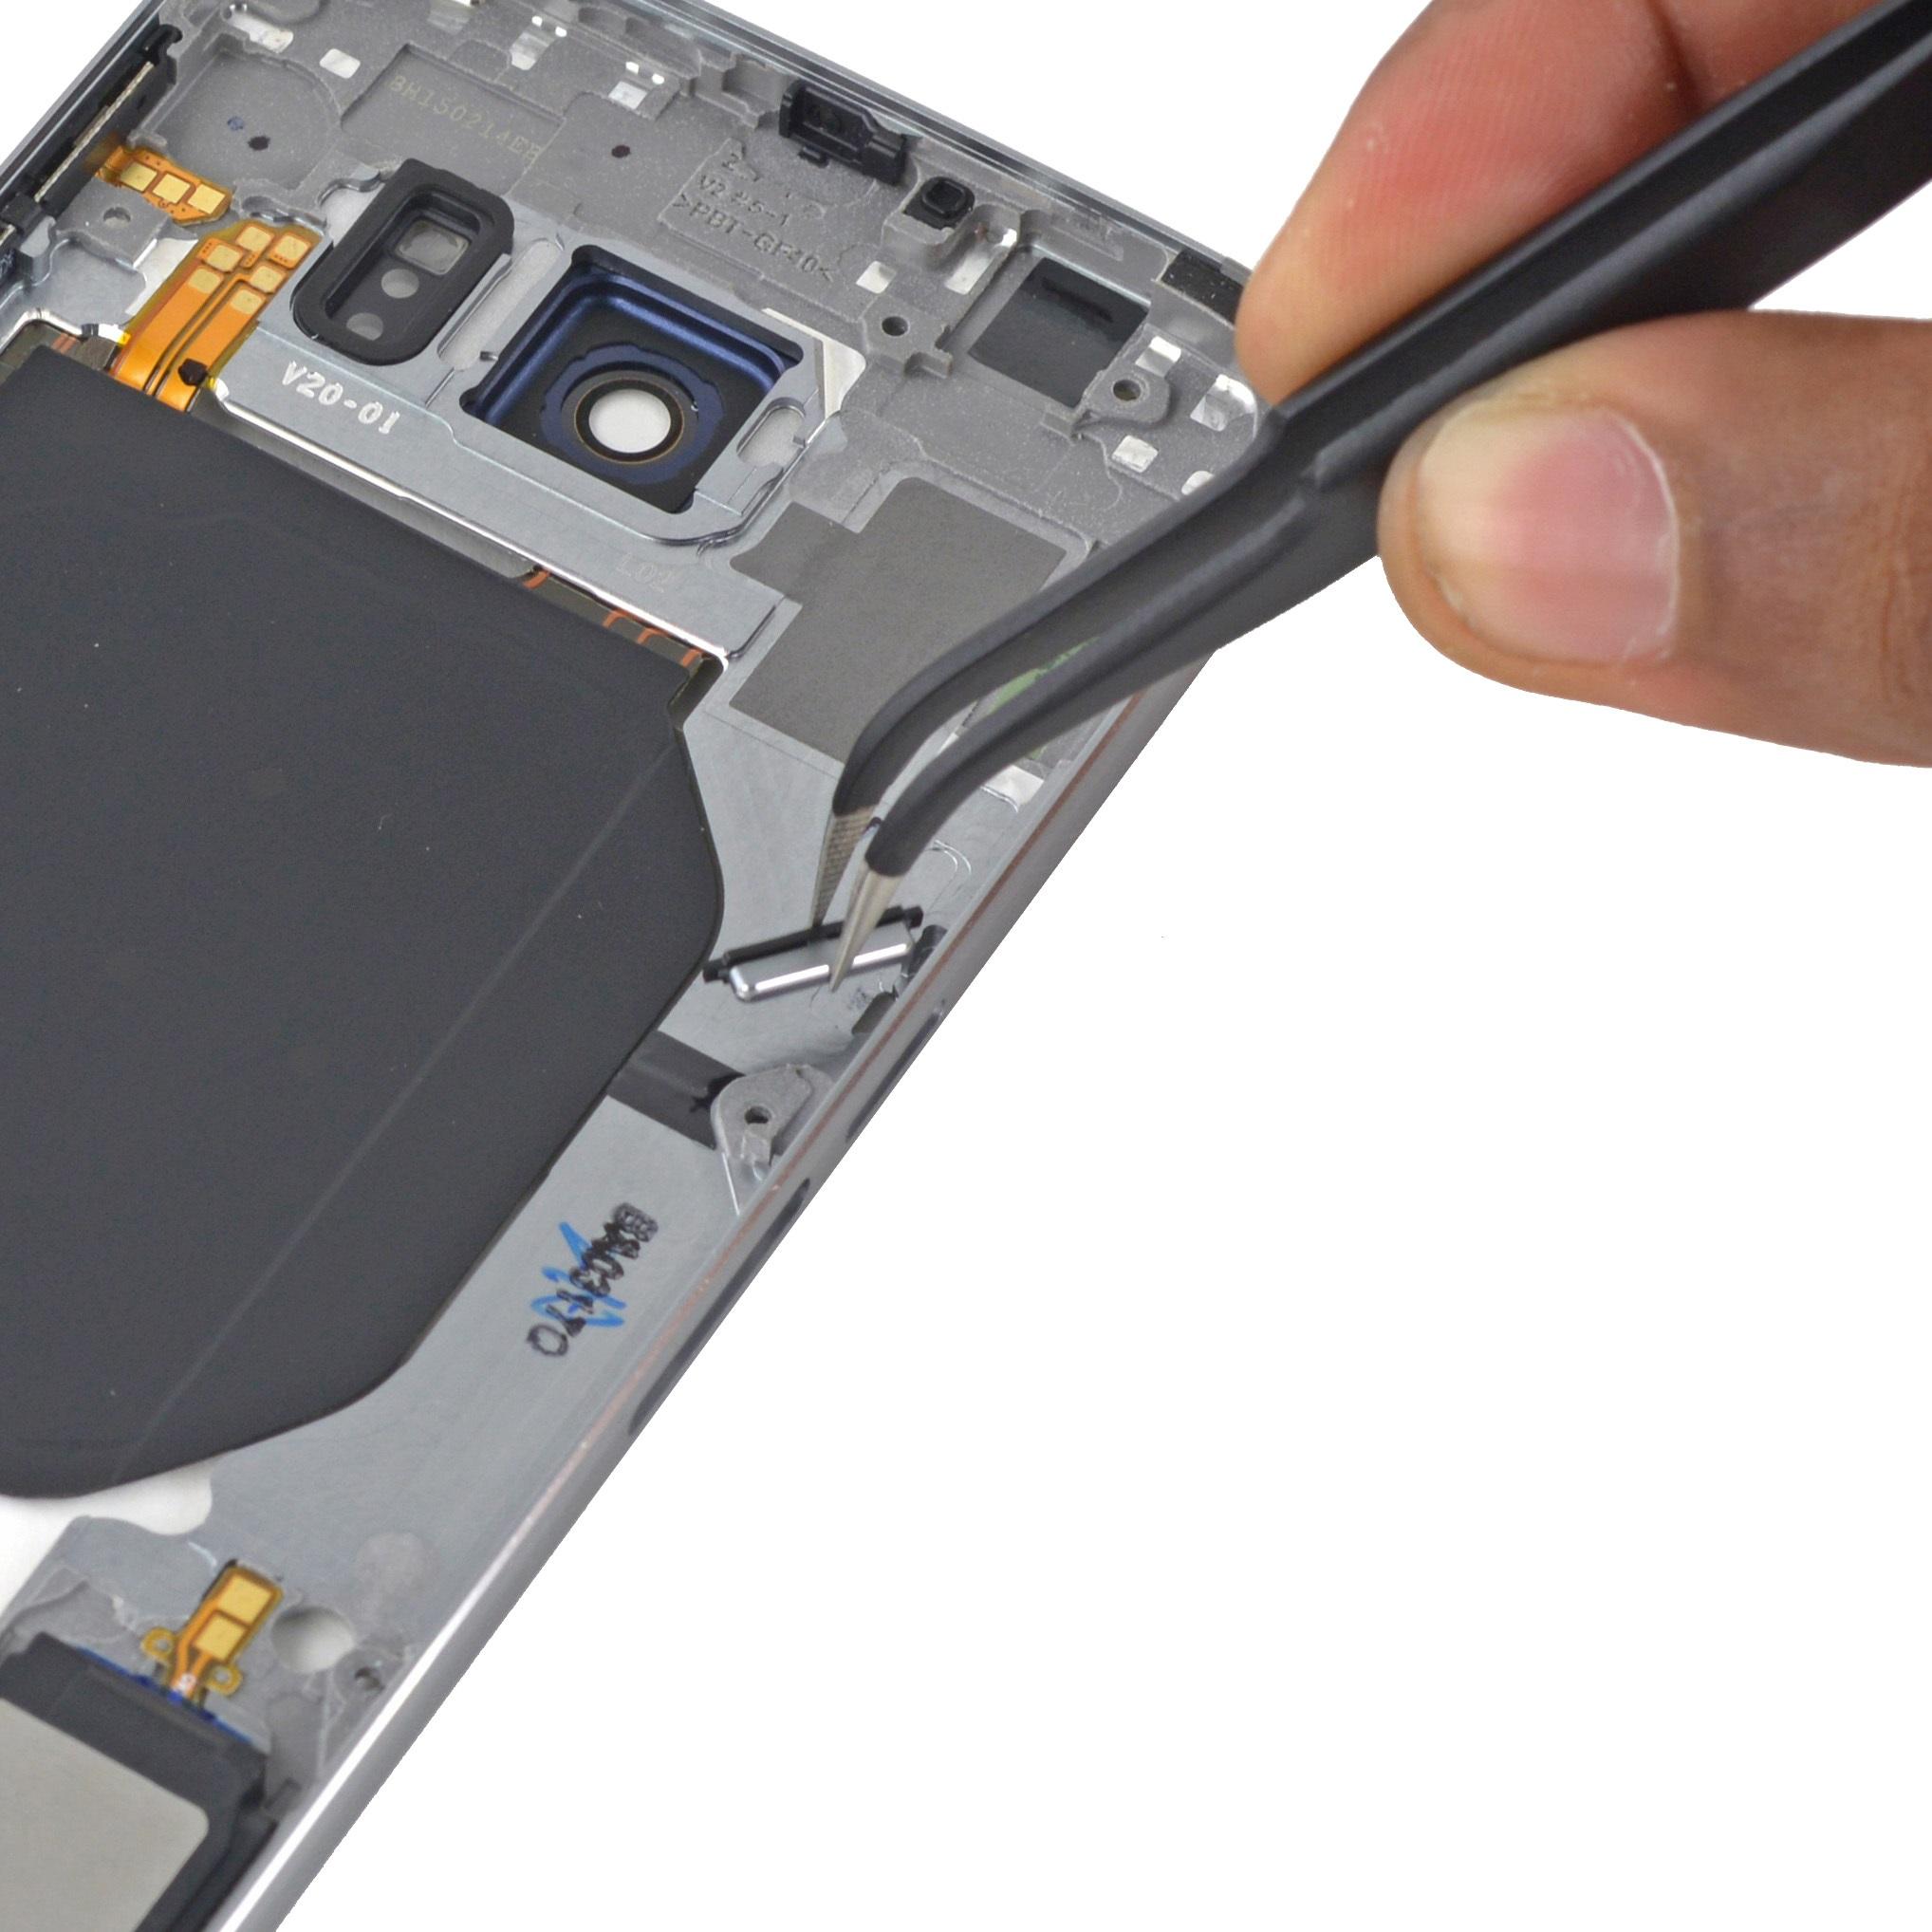 Thay nút nguồn Samsung Galaxy S7 Edge  – dây phím nguồn